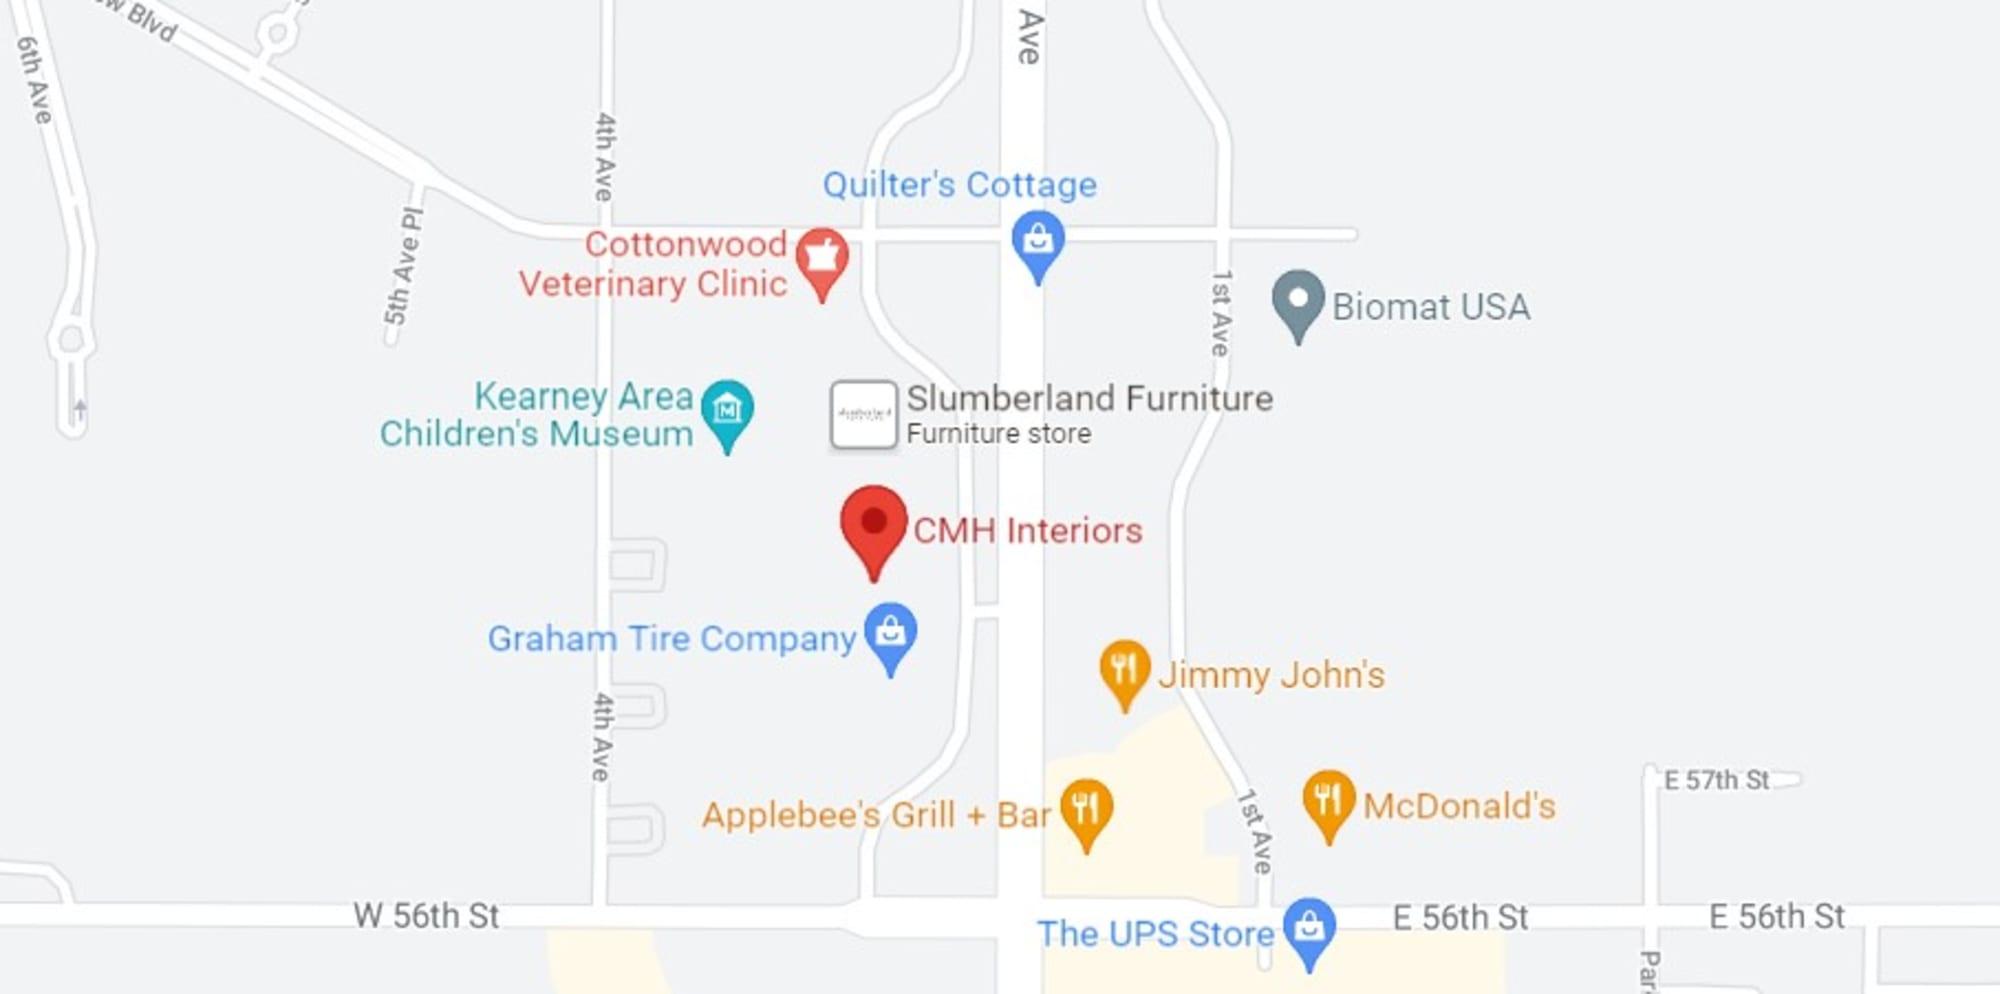 CMH Interiors - 5804 2nd Ave Kearney, NE 68845